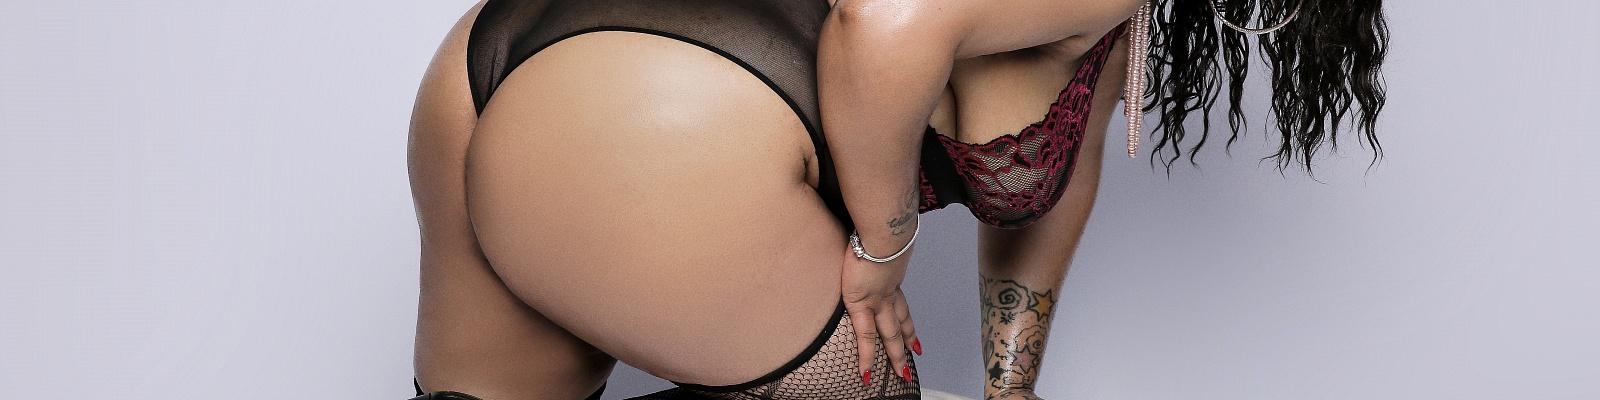 Isabella Fontez's Cover Photo